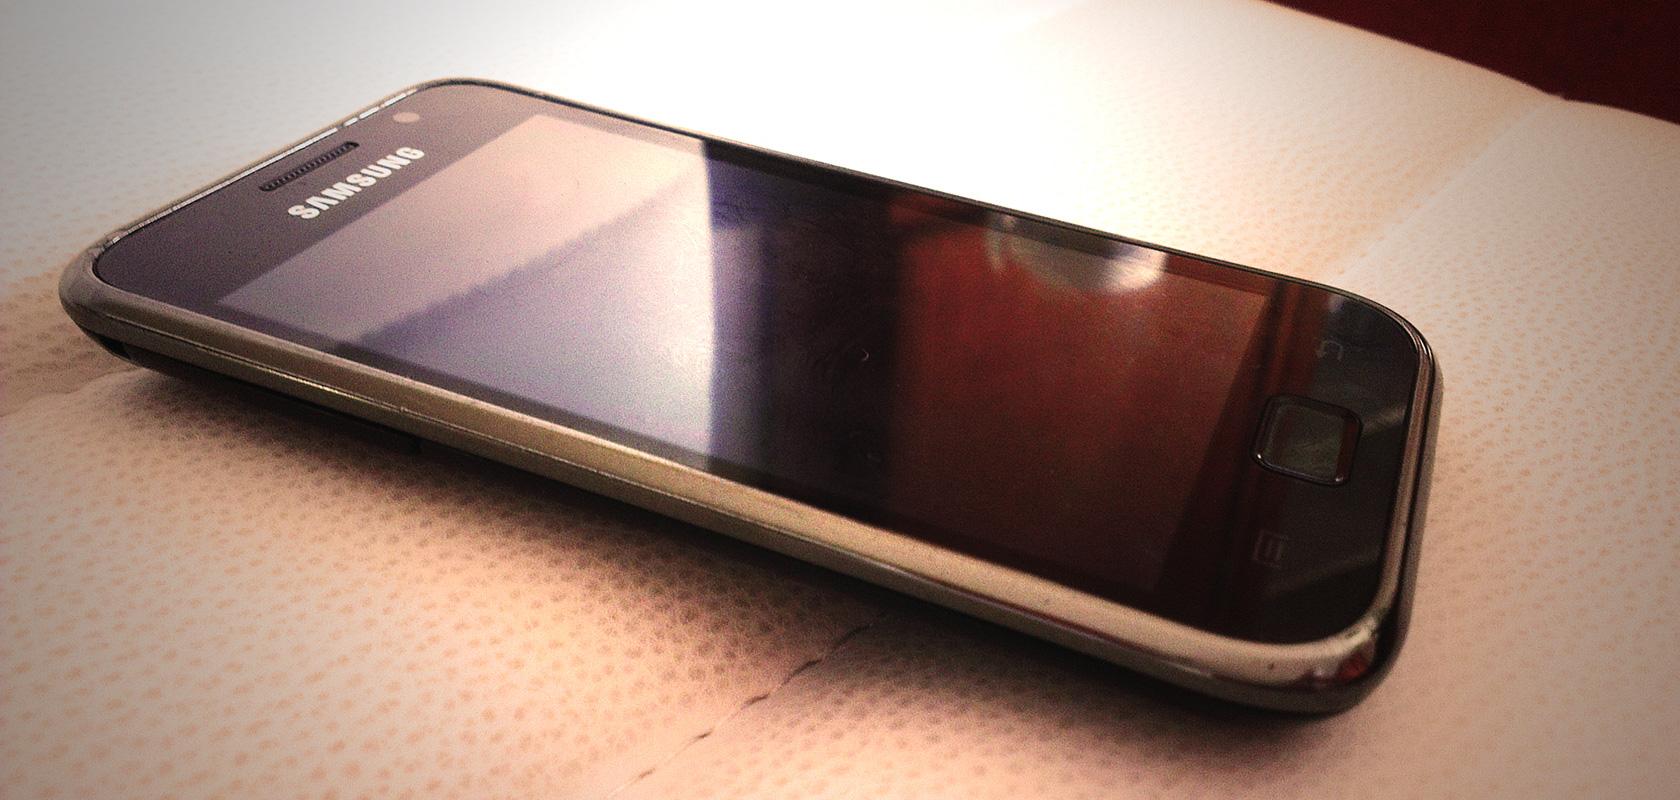 Handy ausstellen